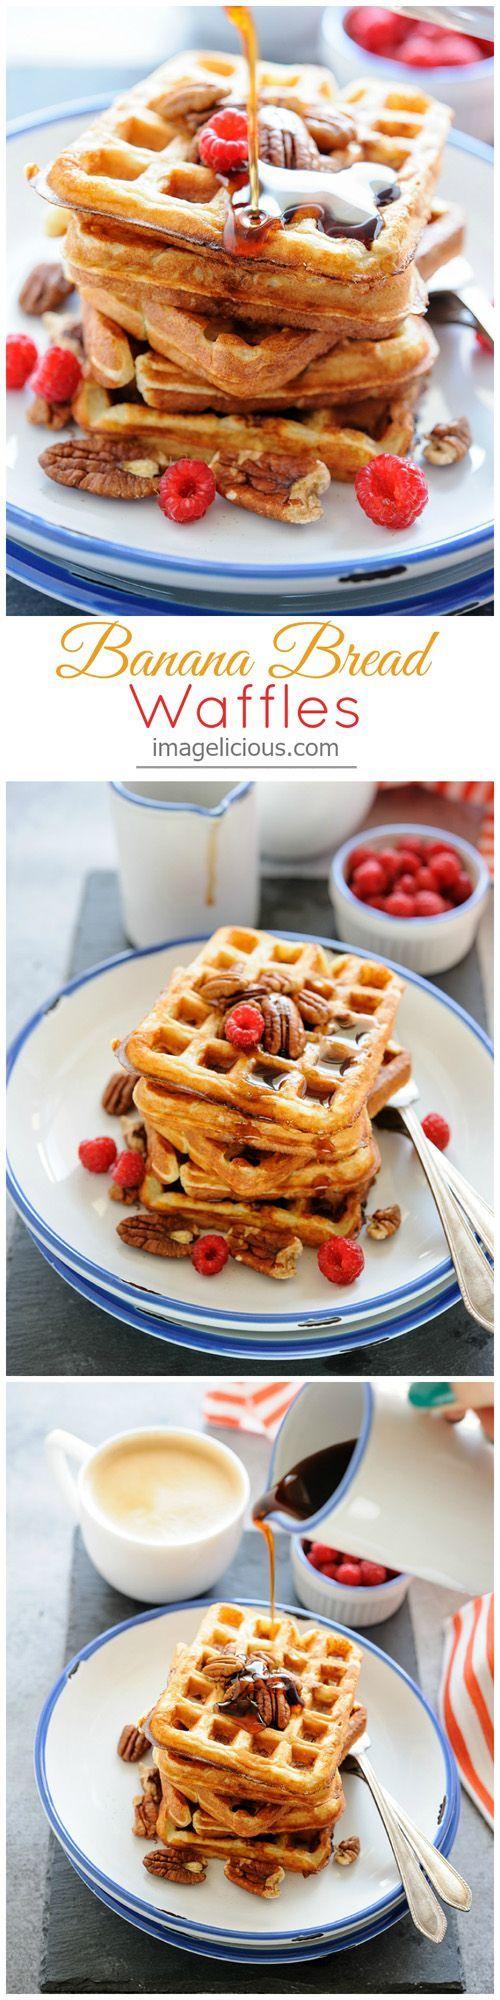 Banana Bread Waffles - it's like having dessert for breakfast   Imagelicious